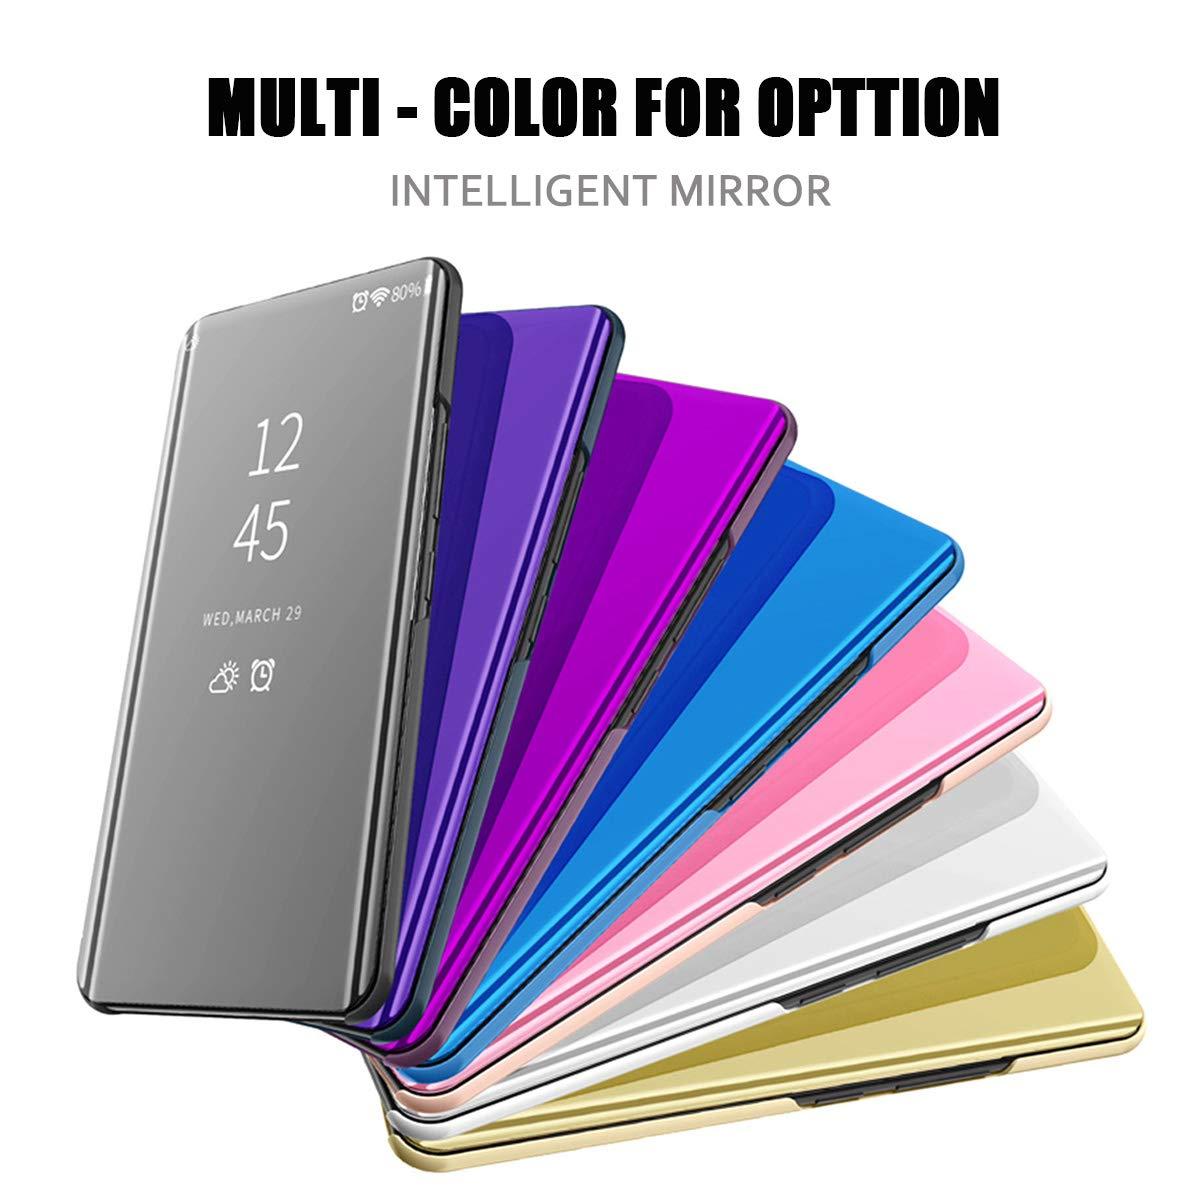 kompatibel Huawei P20 lite//nova 3e H/ülle neueste Mirror Case Spiegel Schutzh/ülle PU Leder Flip Handy Case Clear View Standing Cover f/ür Huawei P20 lite//nova 3e